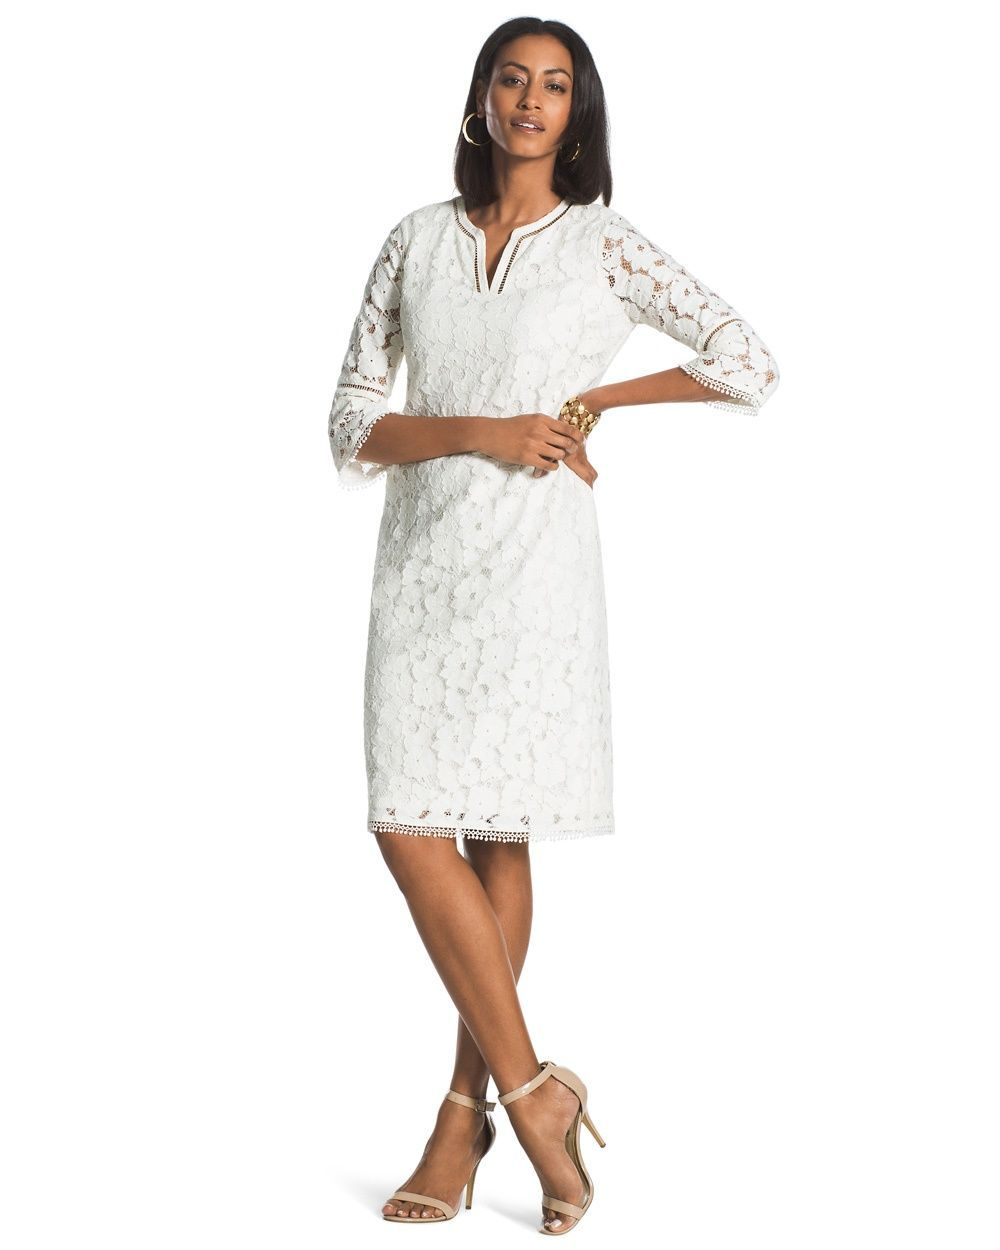 Lace dress cover up  Chicous Womenus Floral Lace Dress  Products  Pinterest  Lace